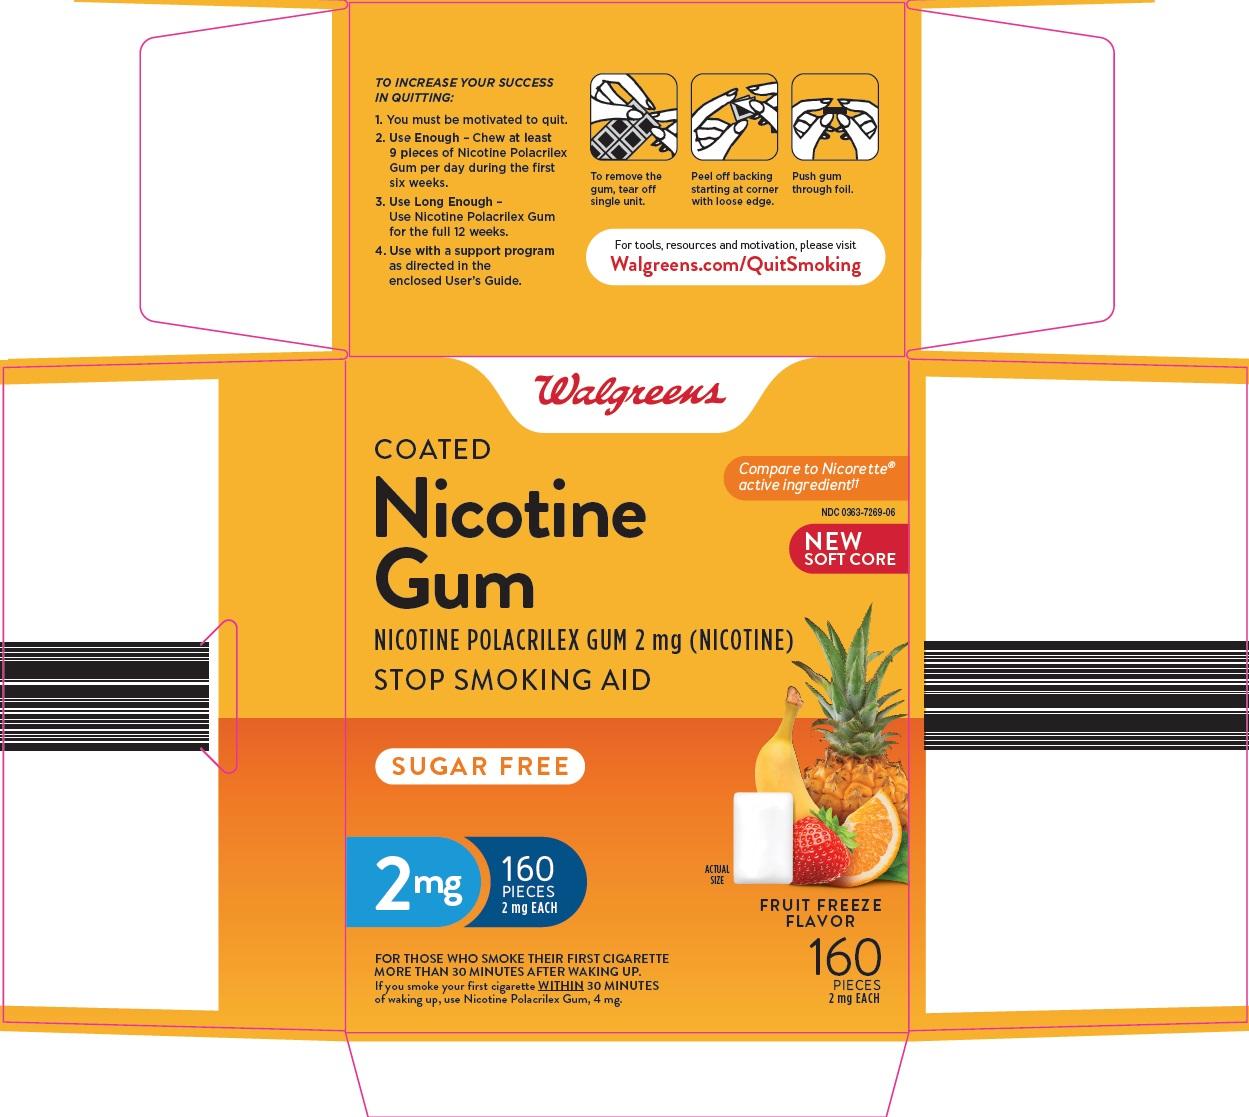 269-94-nicotine-gum-1.jpg